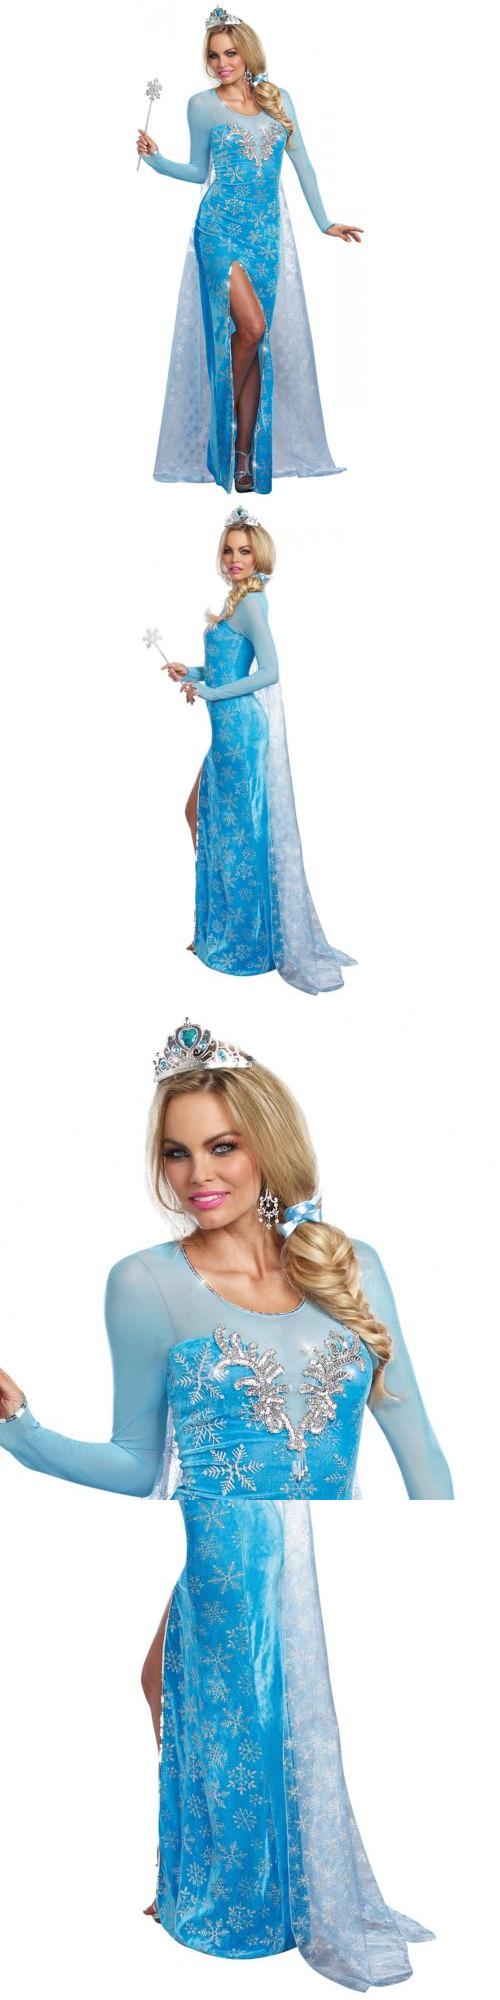 halloween costumes women elsa costume adult fairy tale princess halloween fancy dress buy - Halloween Costumes Of Elsa